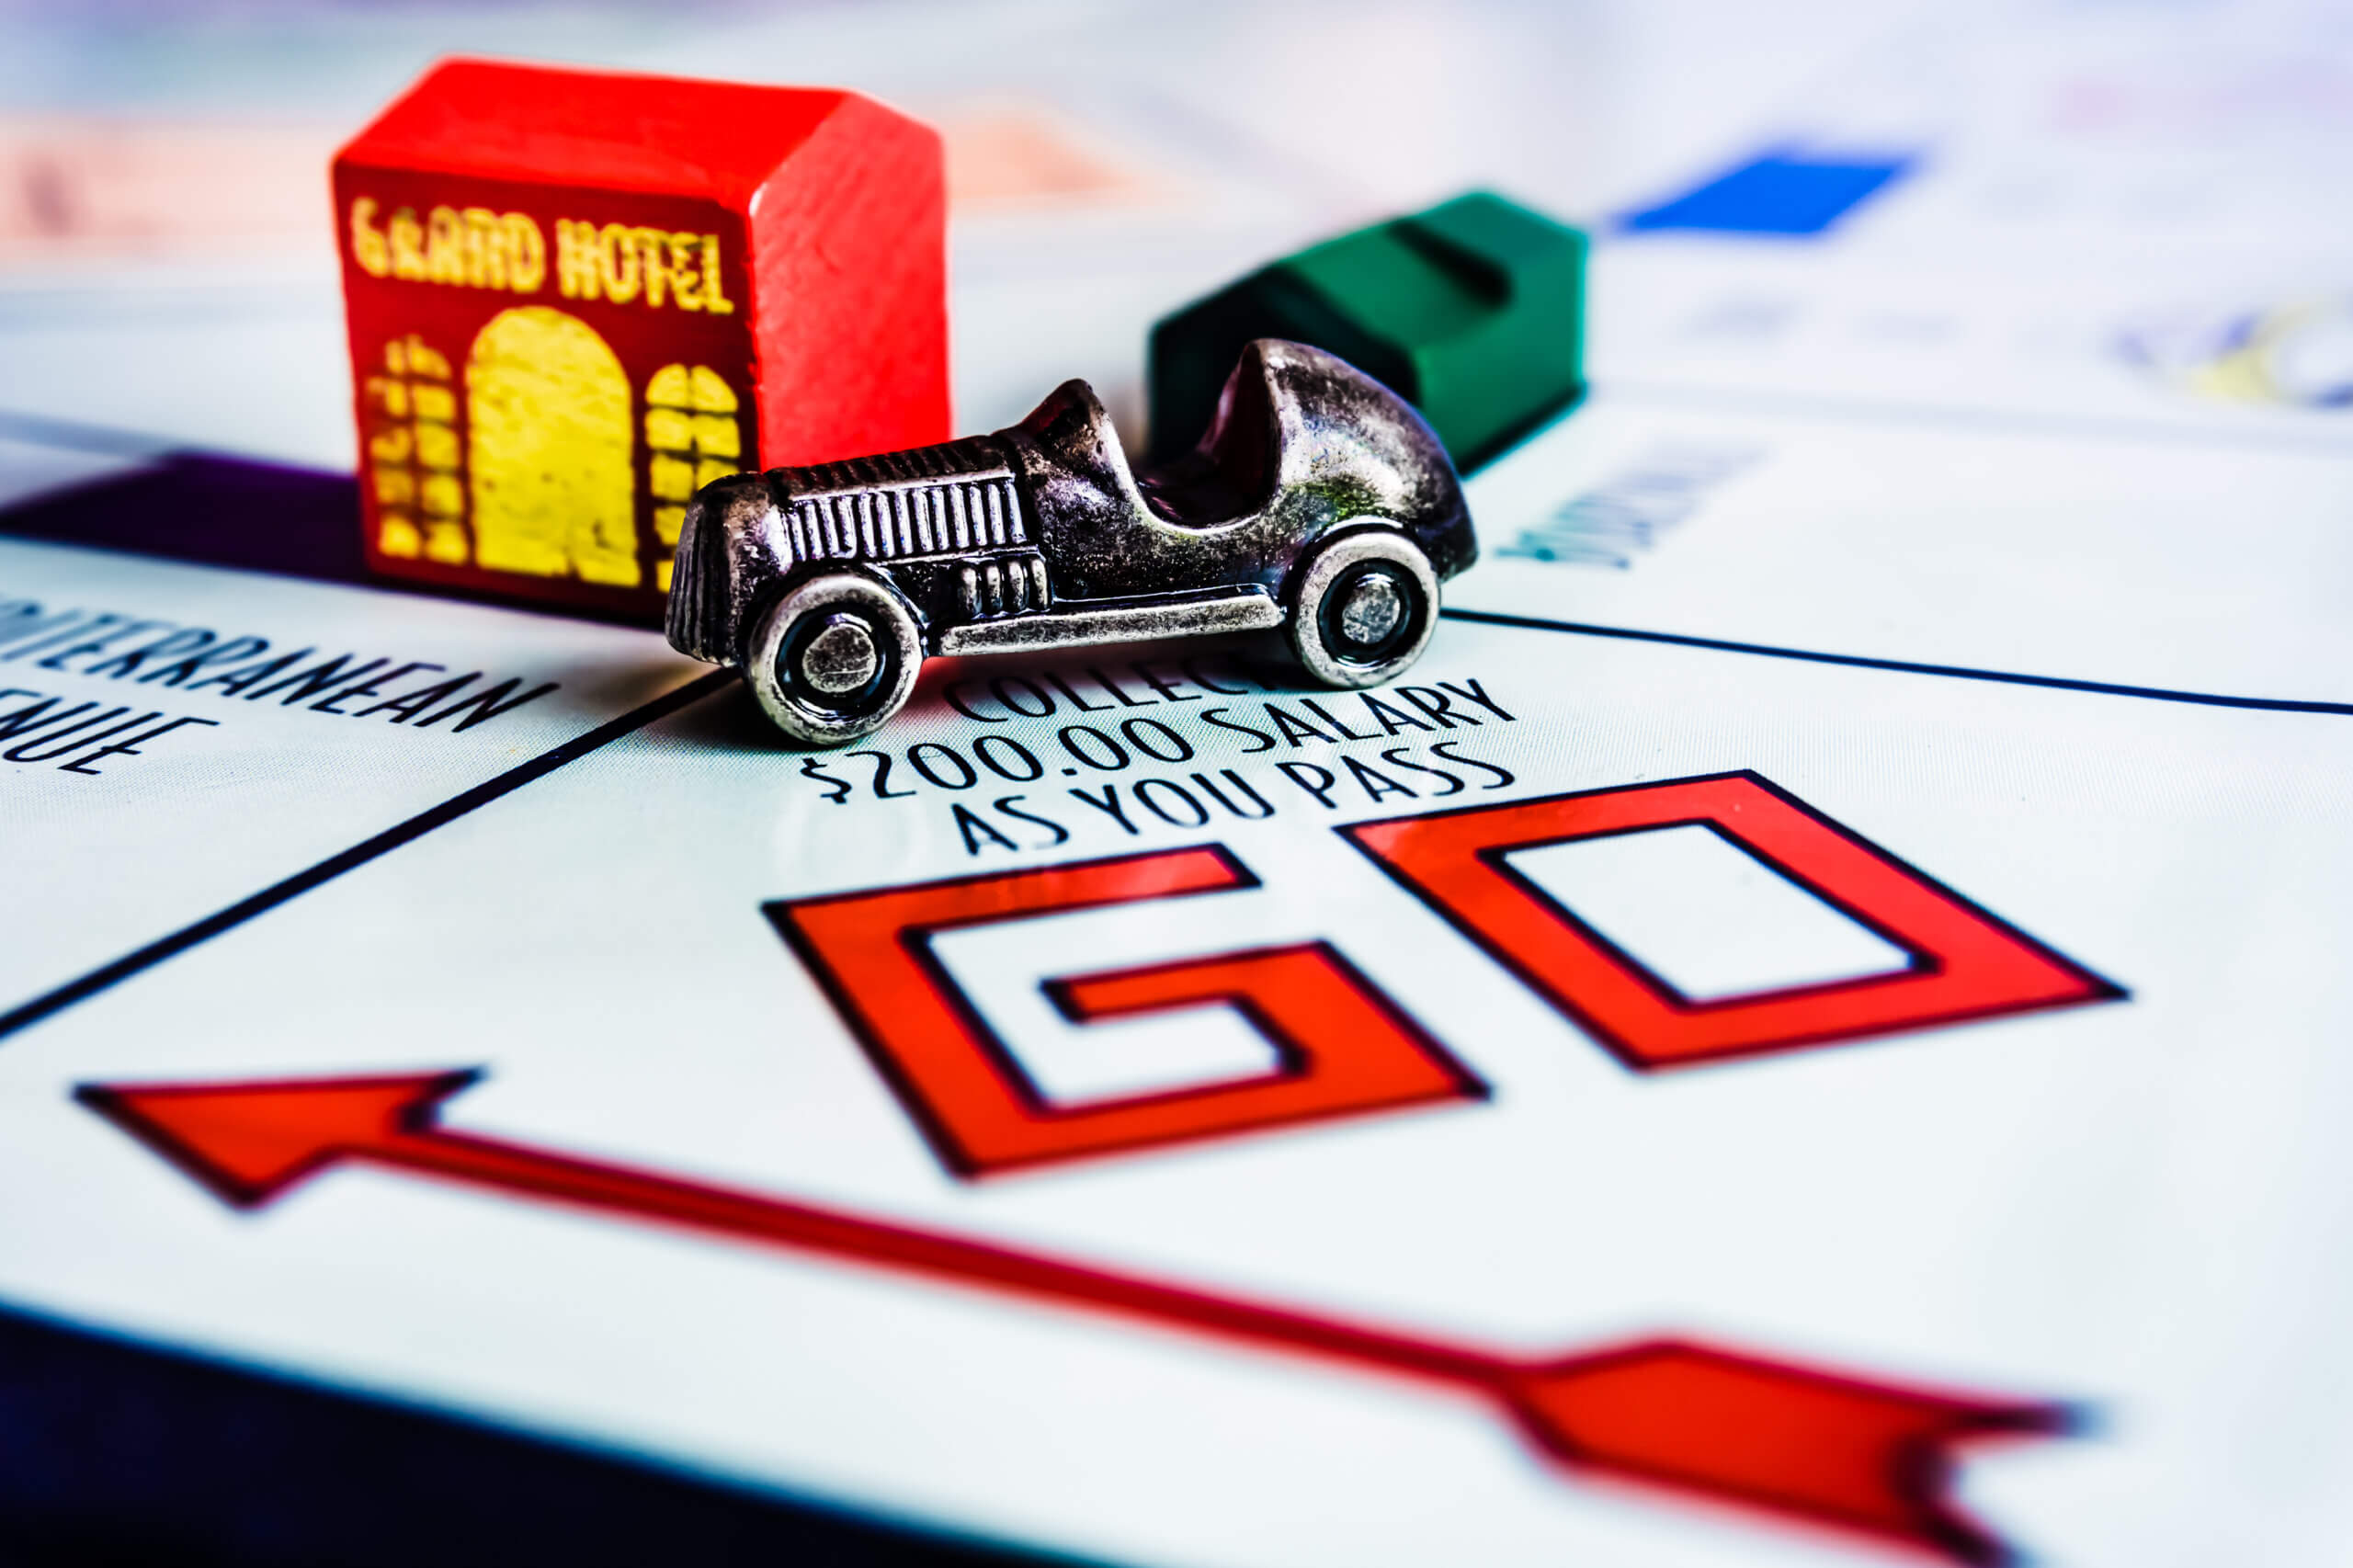 Nahaufnahme eines Monopoly-Spielfelds